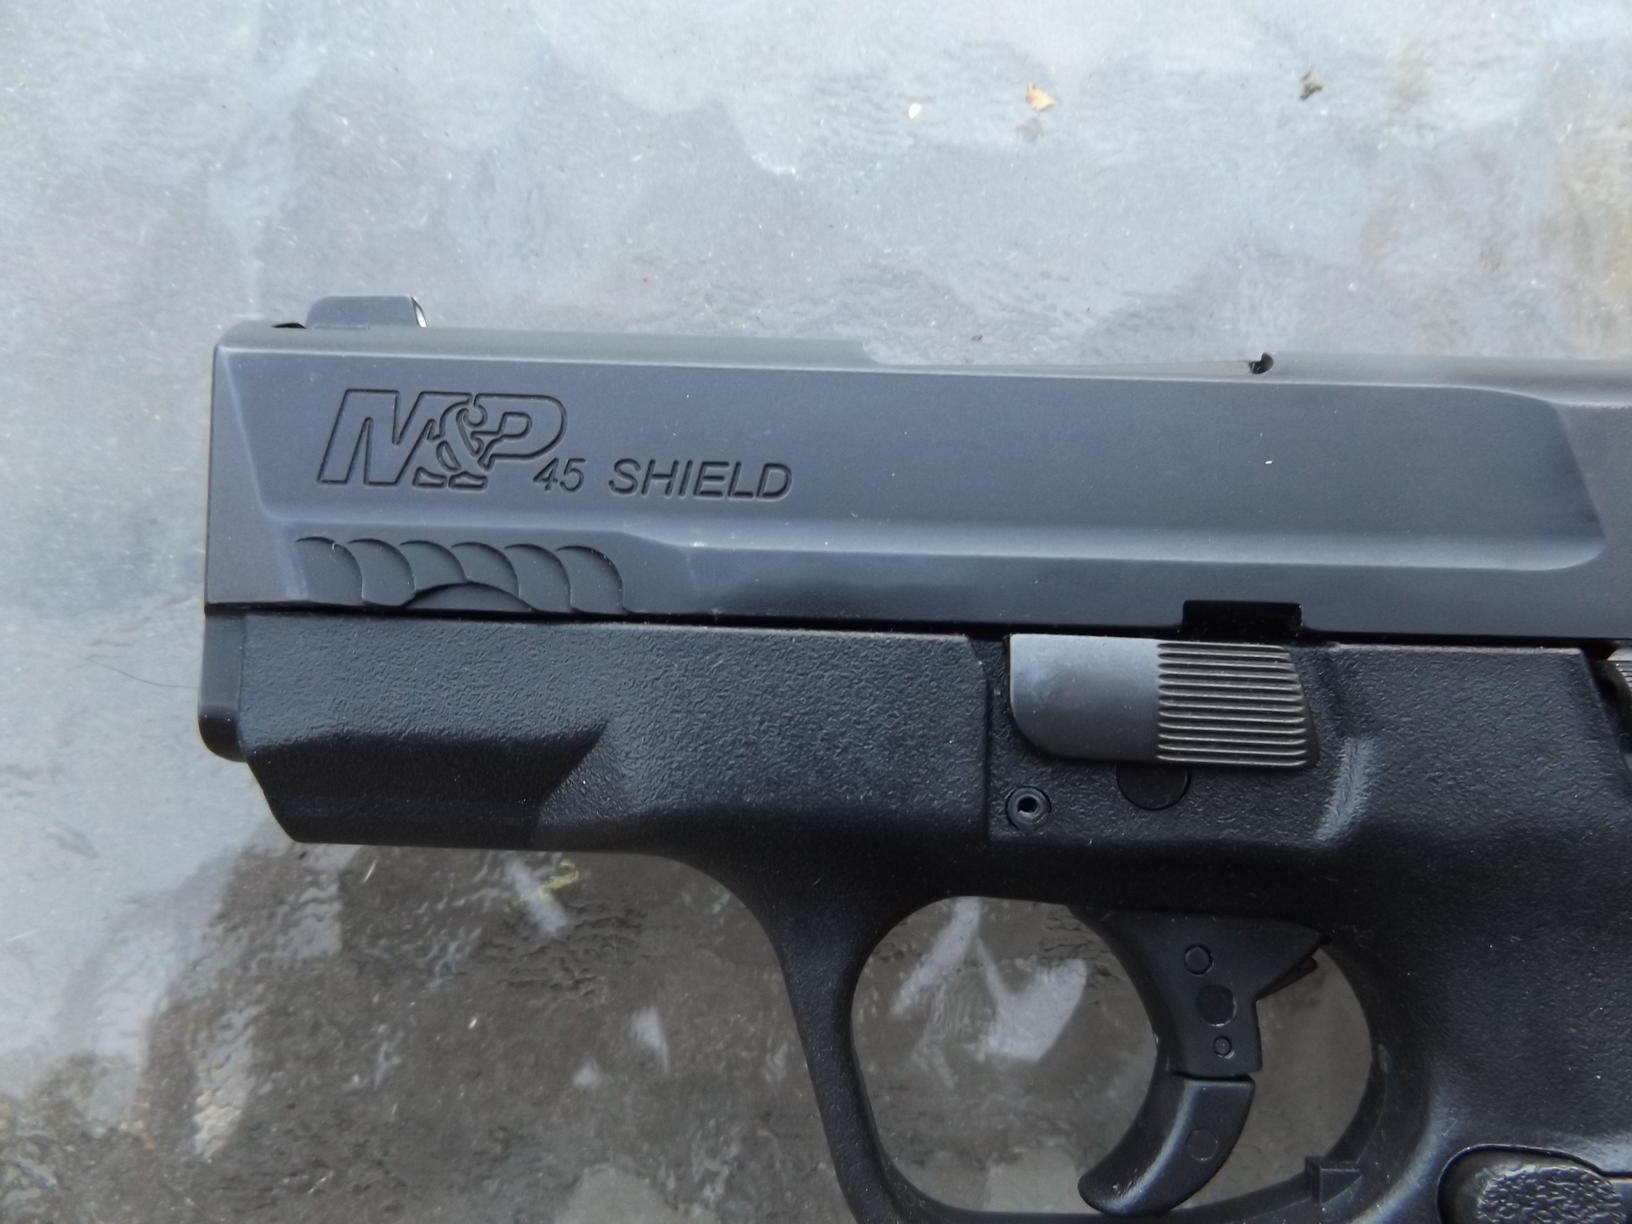 S&W M&P Shield  45 ACP, by Pat Cascio - SurvivalBlog com